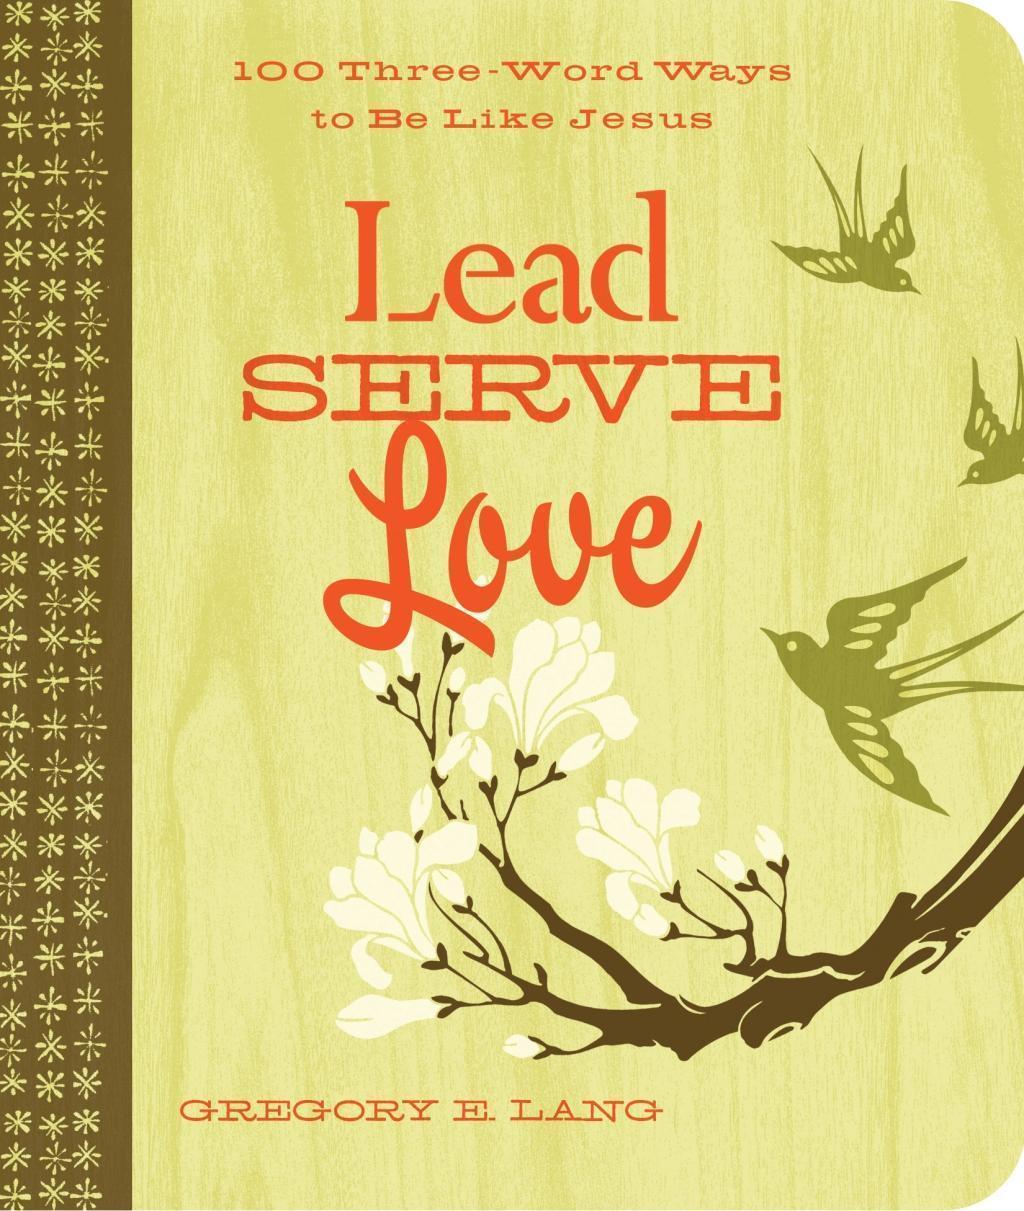 Lead. Serve. Love.